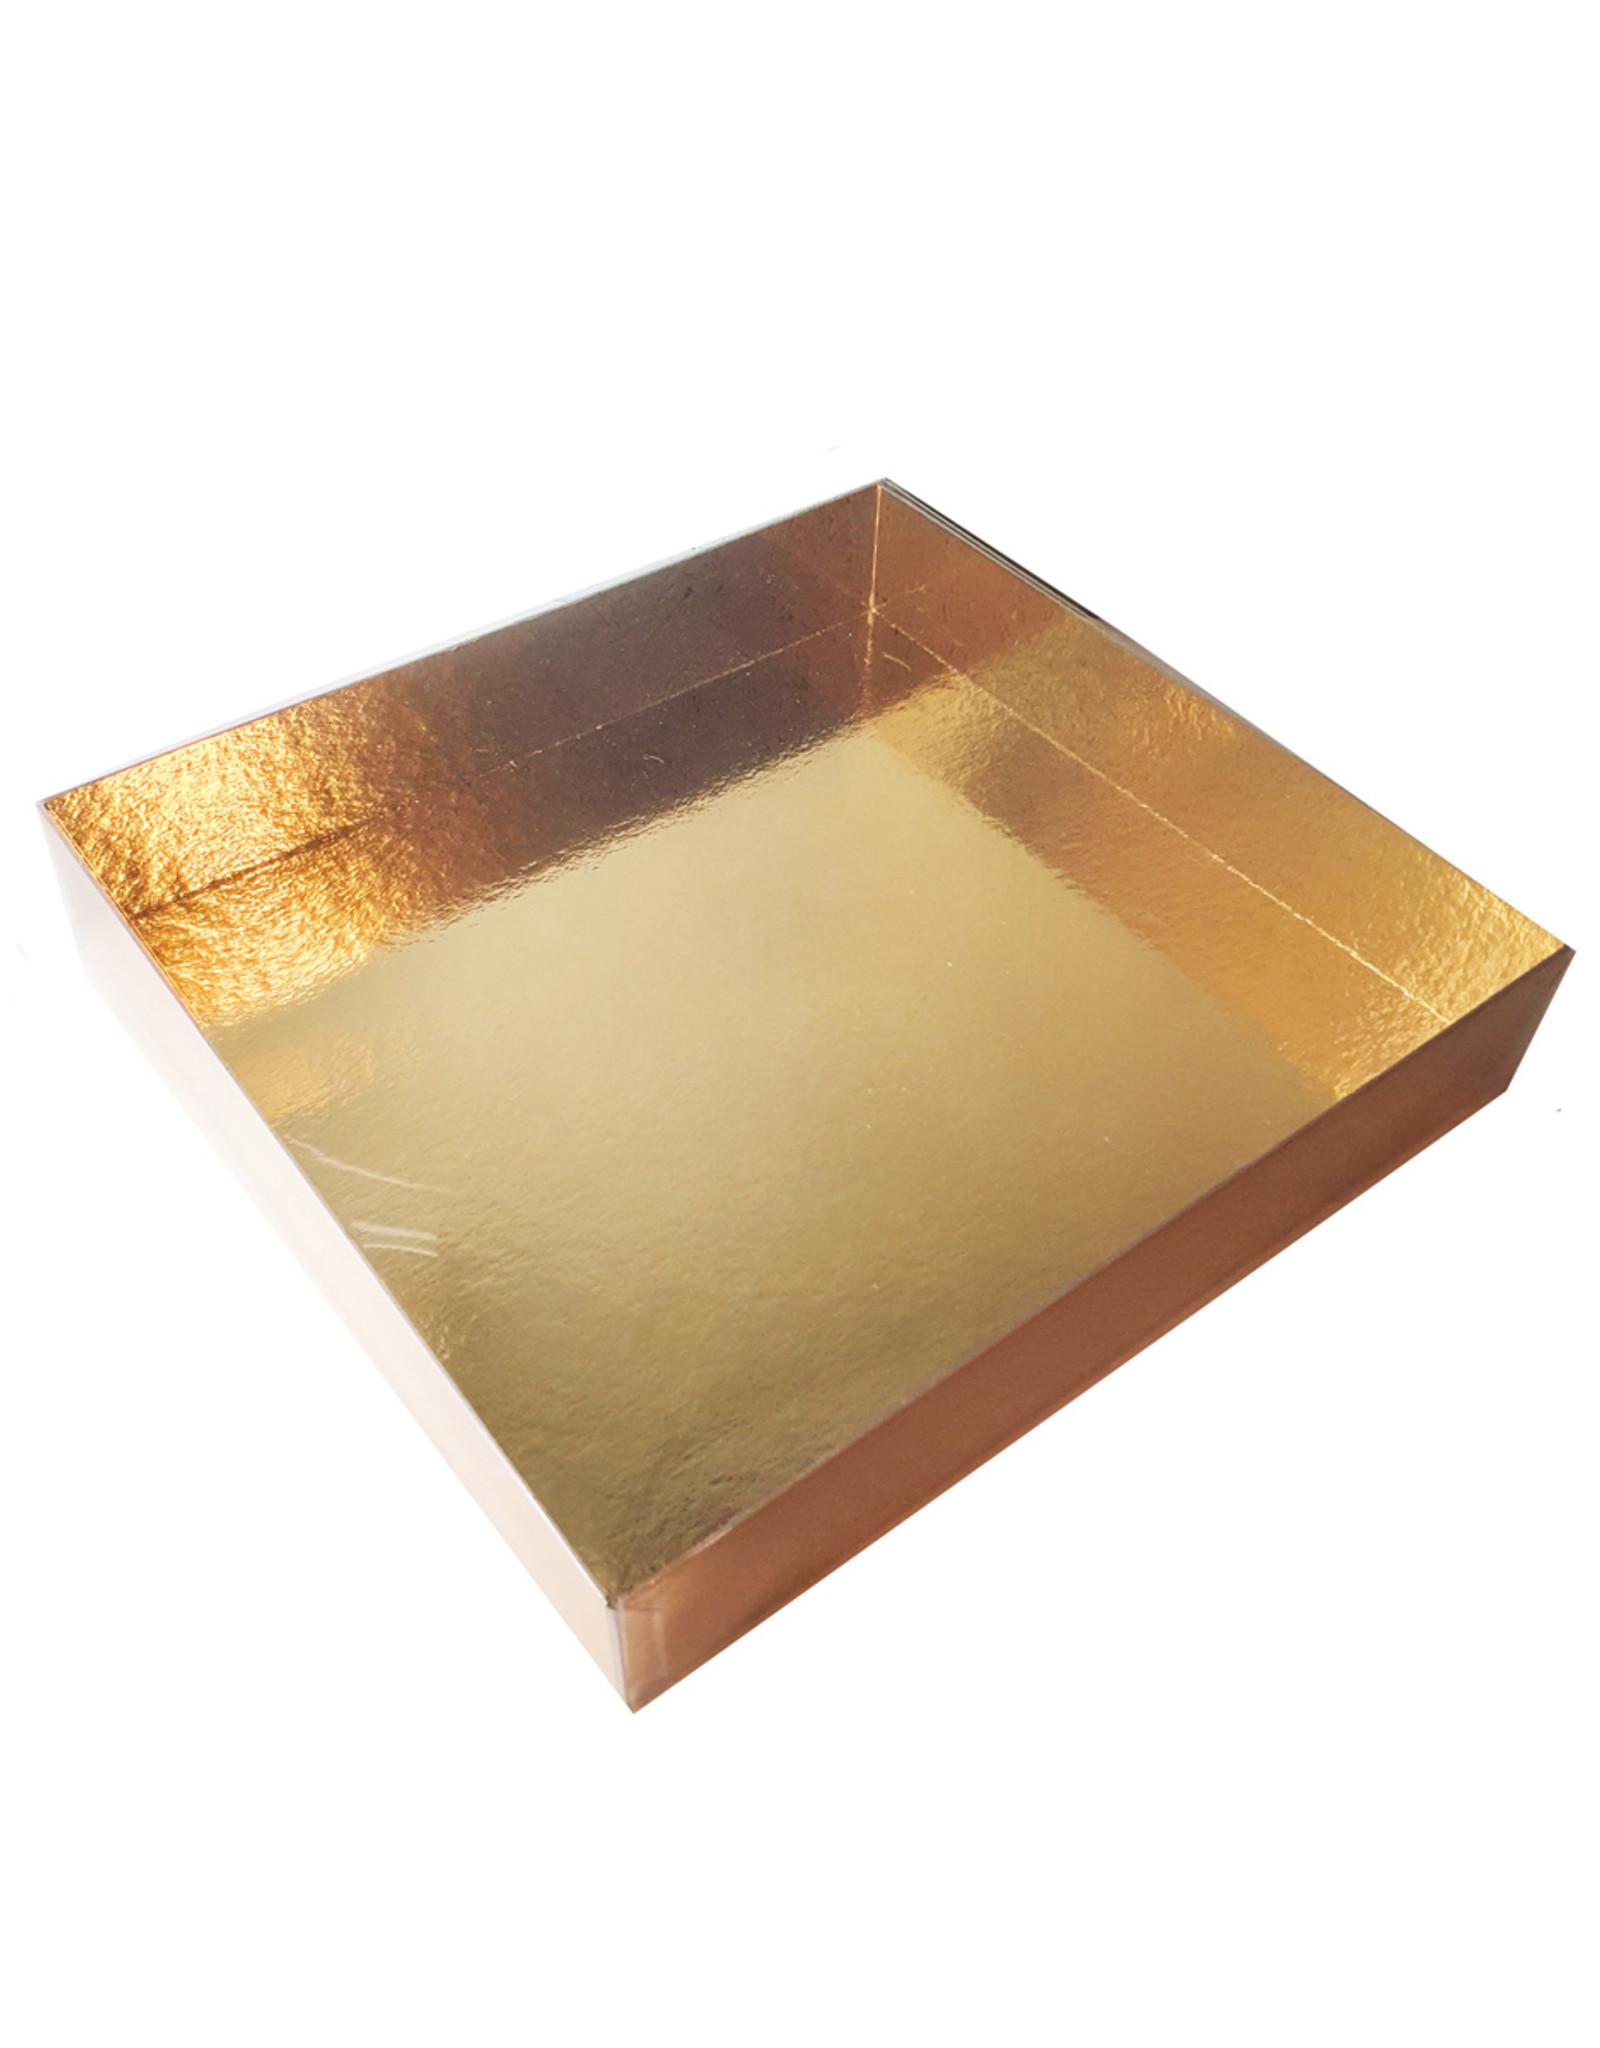 Transparante sweets box - 260 x 245 x 45 mm (per 60 stuks)